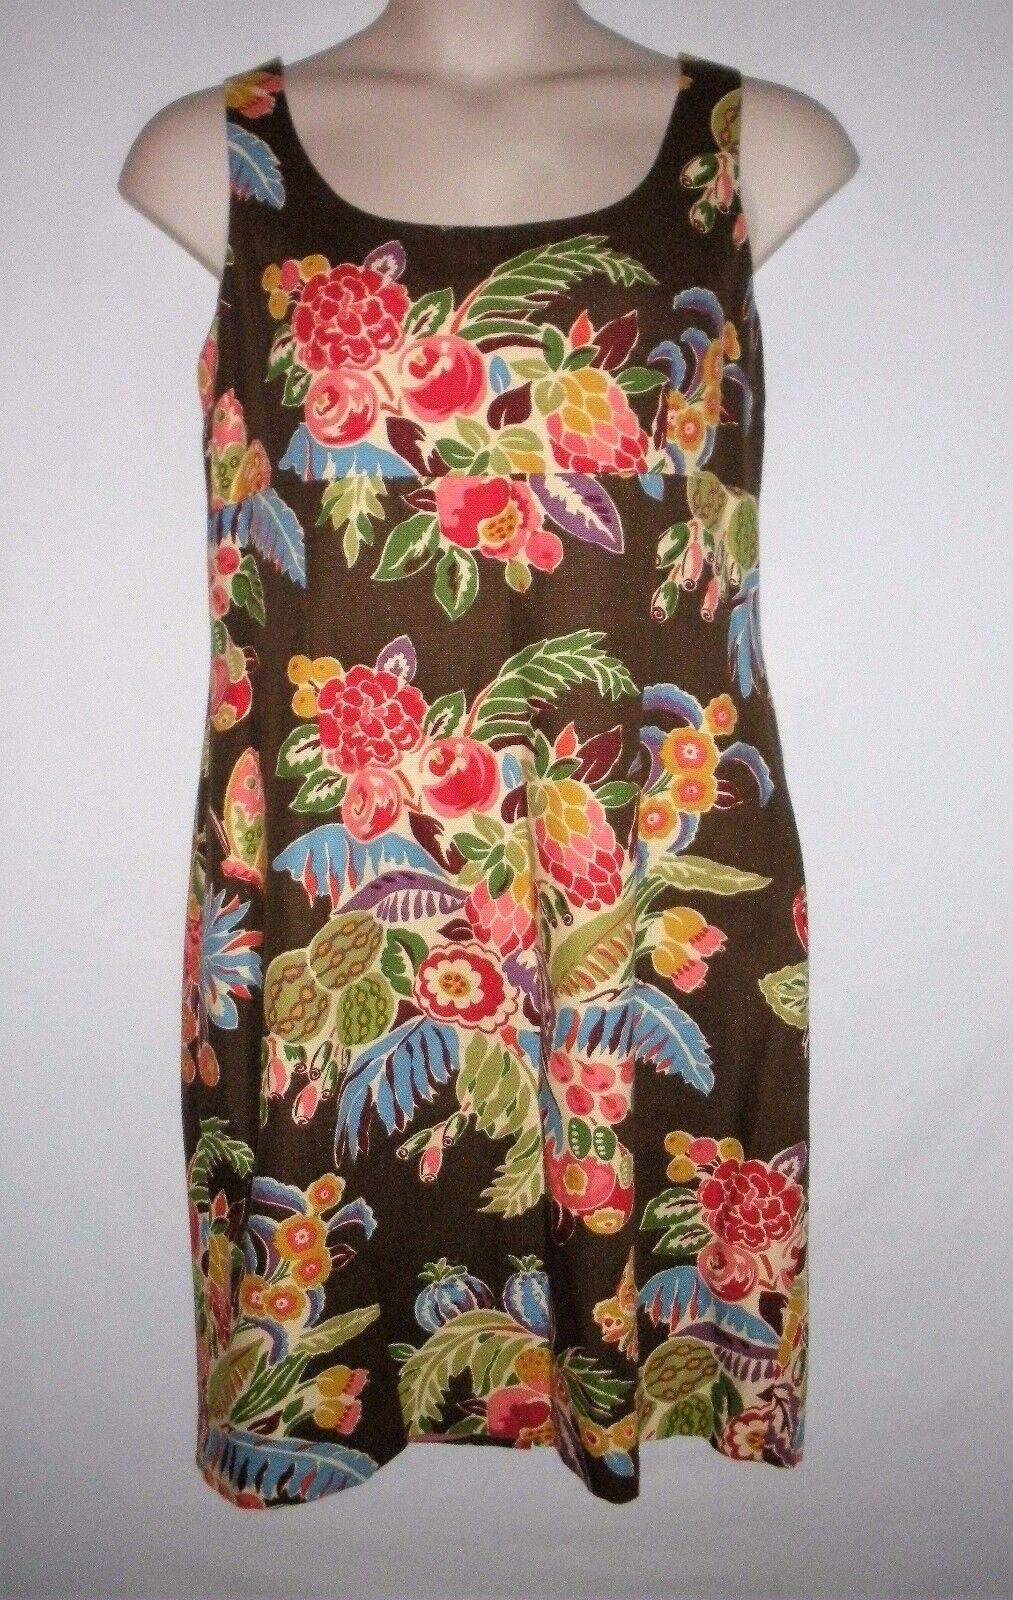 NEW WITH TAG  TALBOTS, Größe 16, Floral Dress MSRP  - braun Multi Farbe